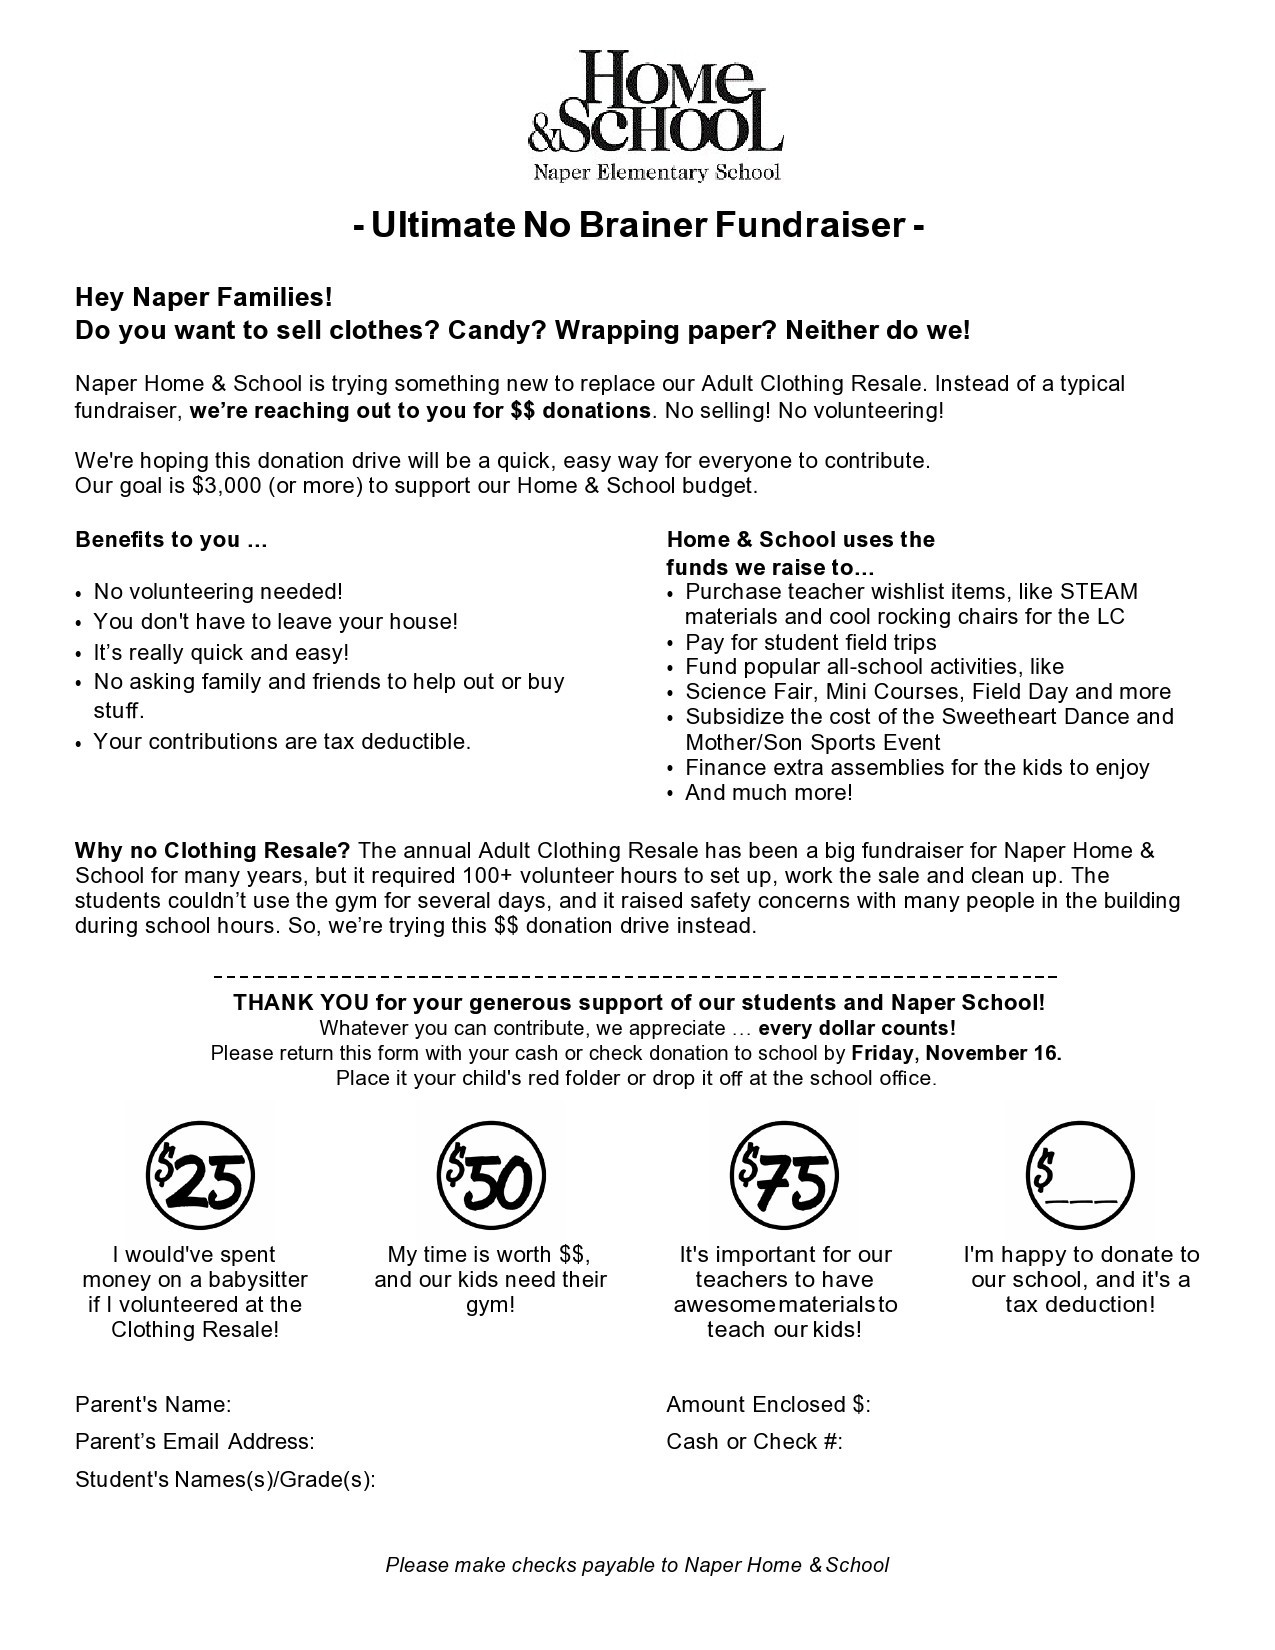 Free fundraiser flyer 15